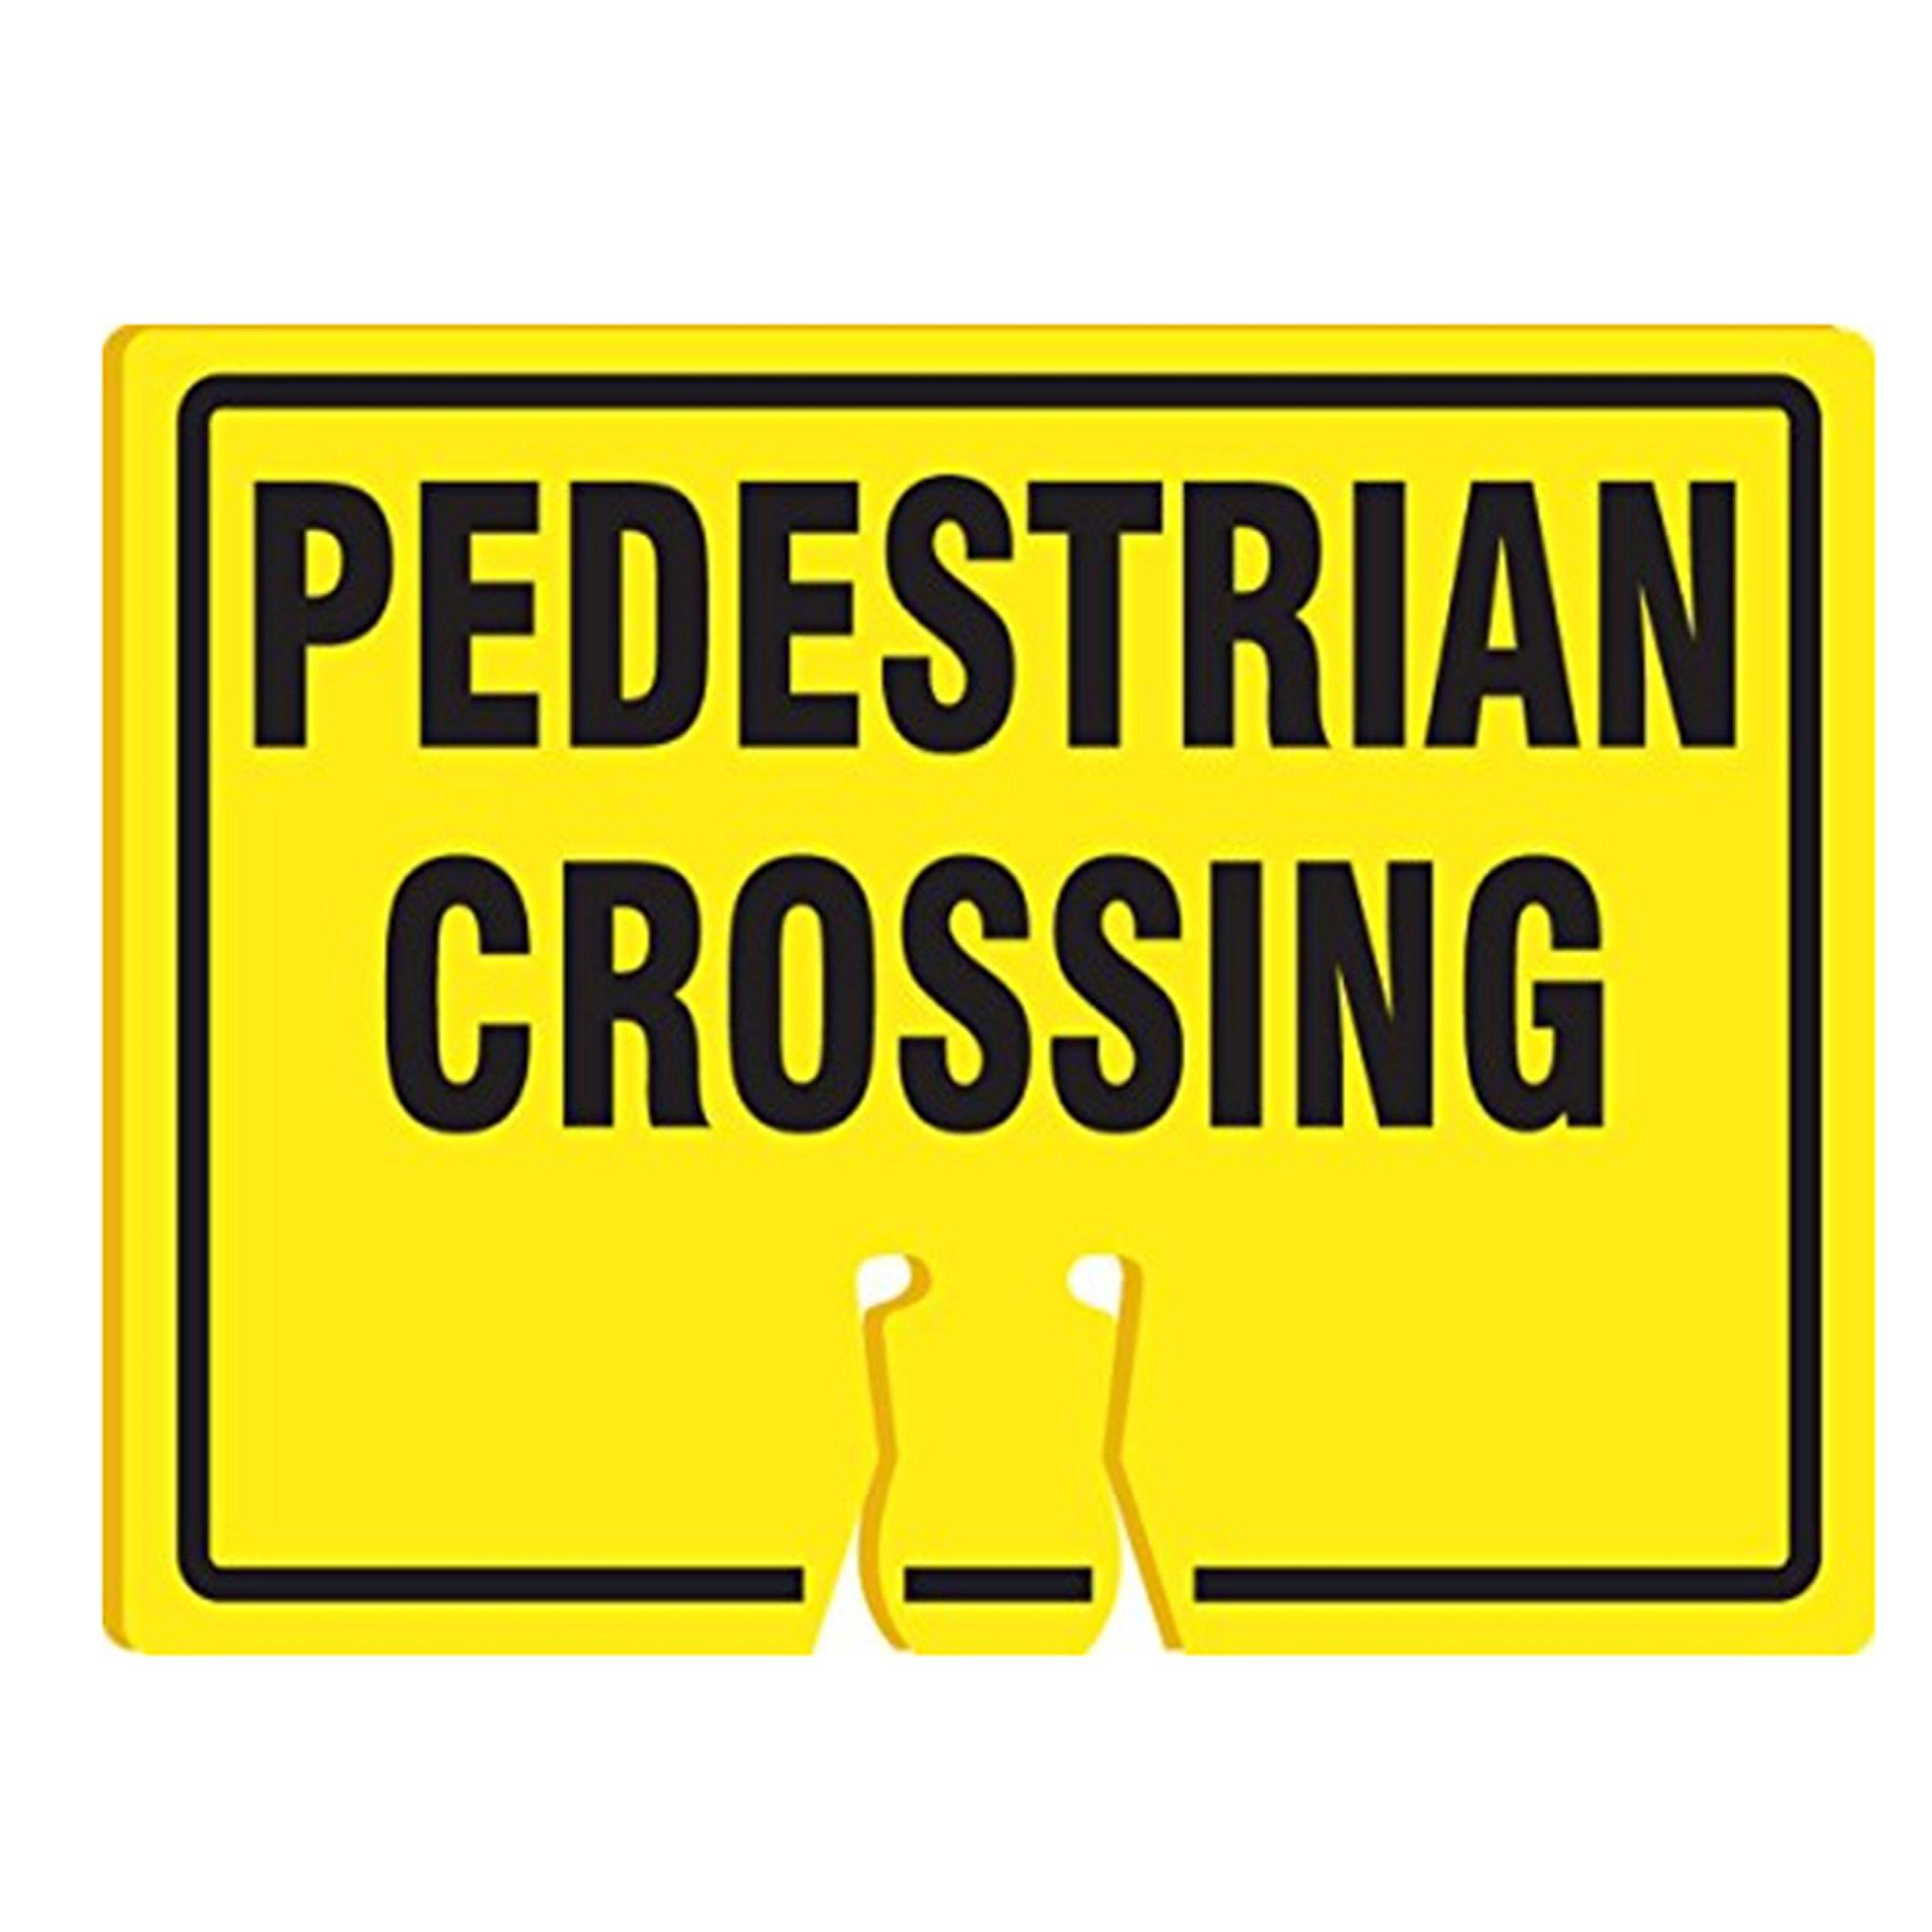 RK Traffic Cone Sign 39 Legend ''Pedestrian Crossing'', 18'' Width x 14'' Height, Black on Yellow